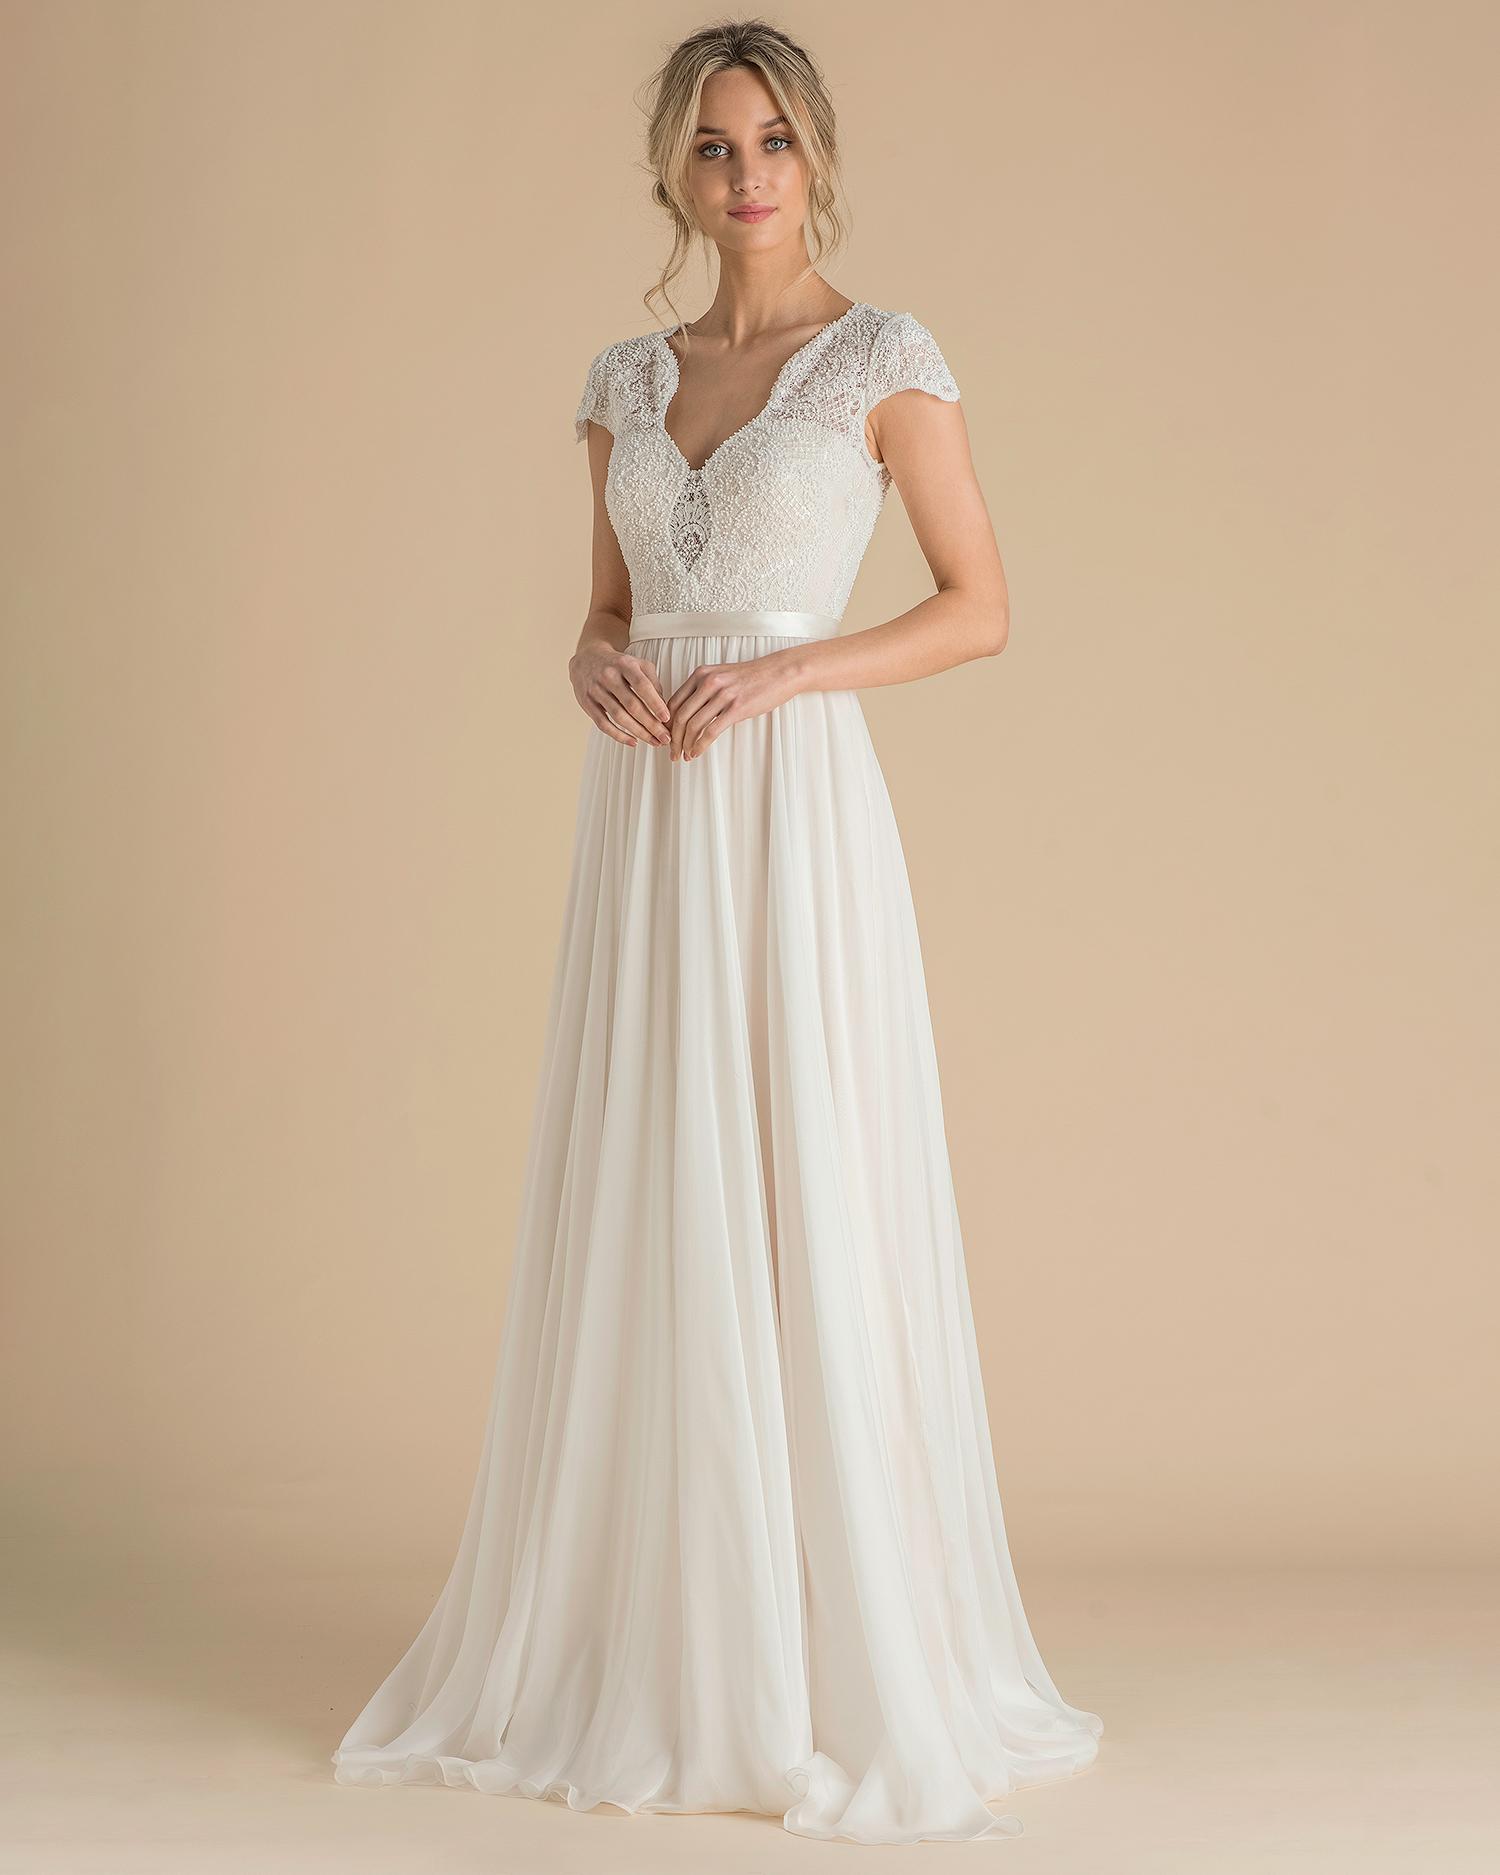 catherine deane wedding dress spring 2019 cap-sleeve beaded bodice